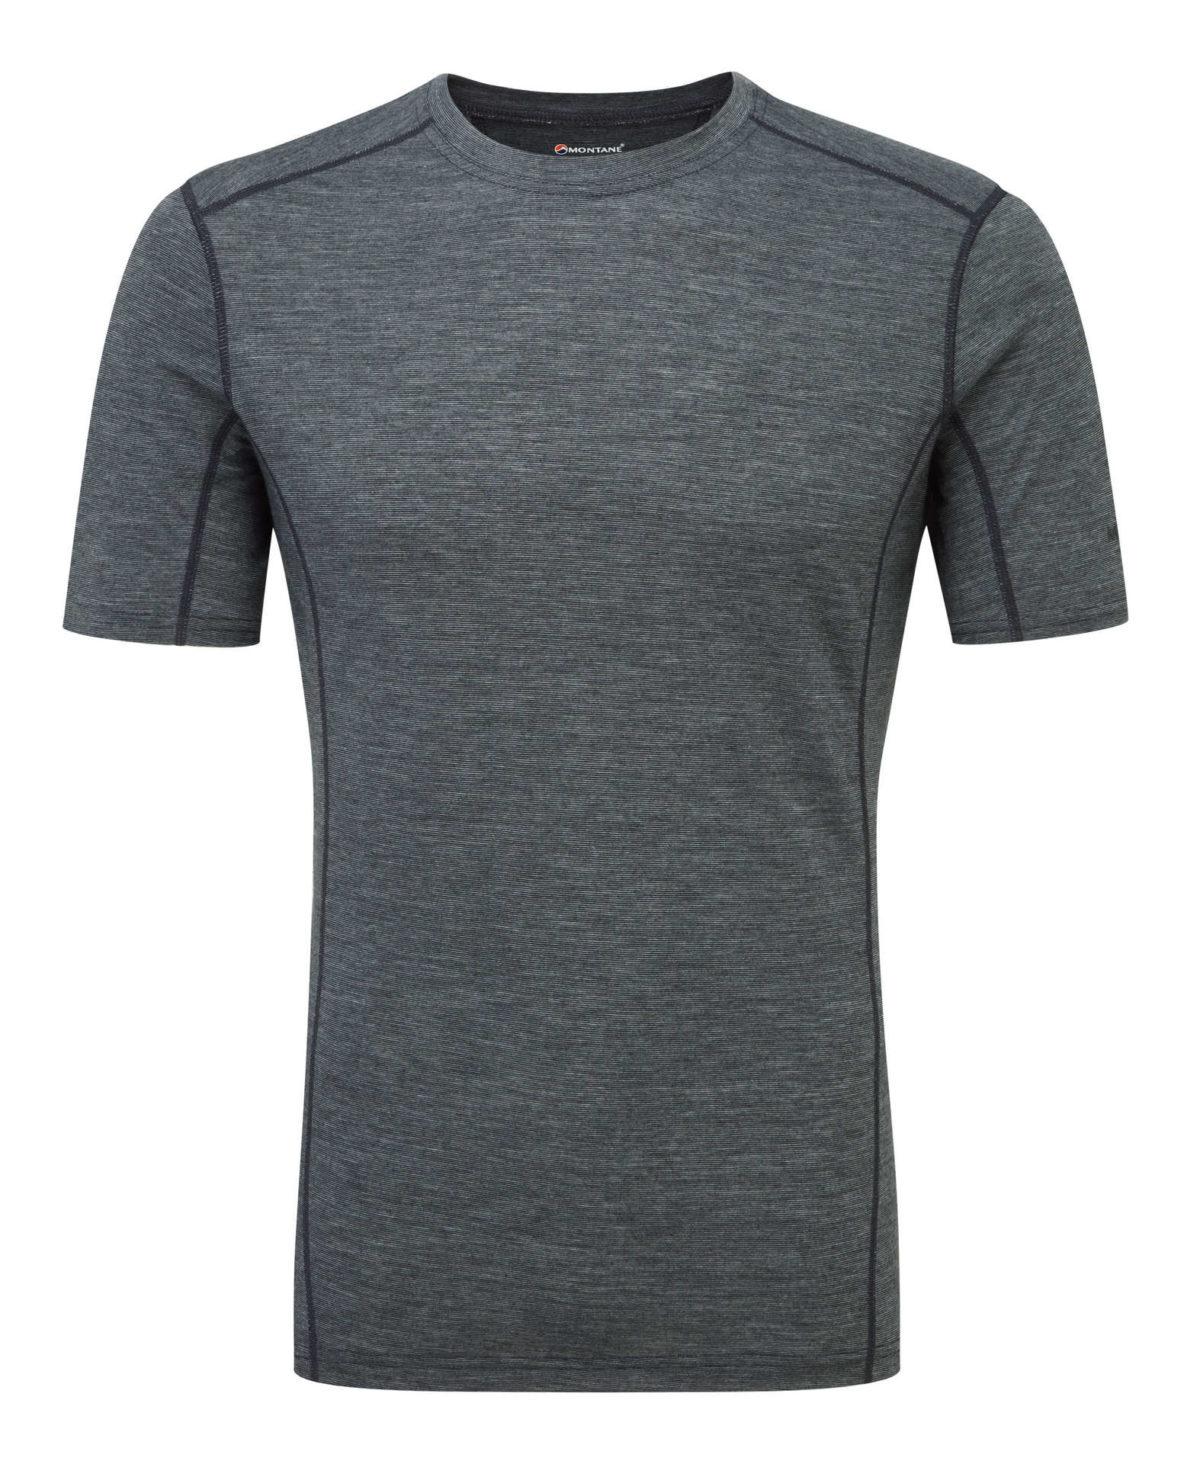 Primino T- shirt from Montane